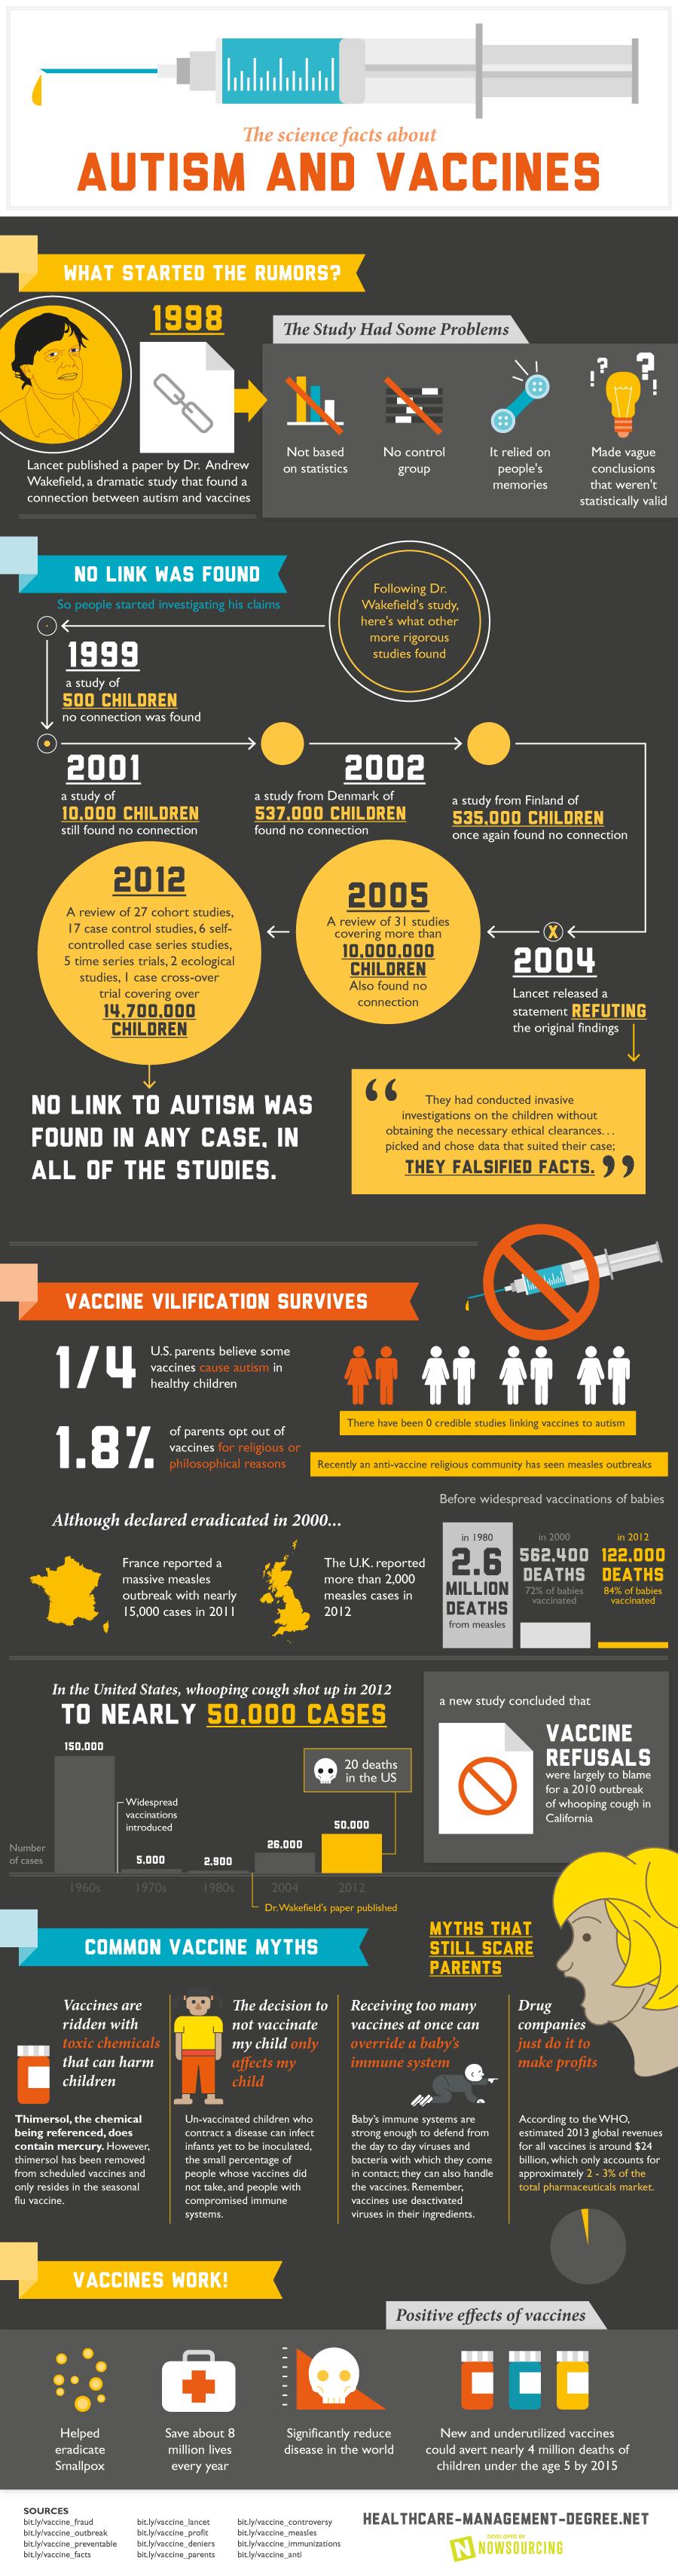 vaccines-and-autism-89a95934a2e5e6433d229e2f44ee4b8f.png